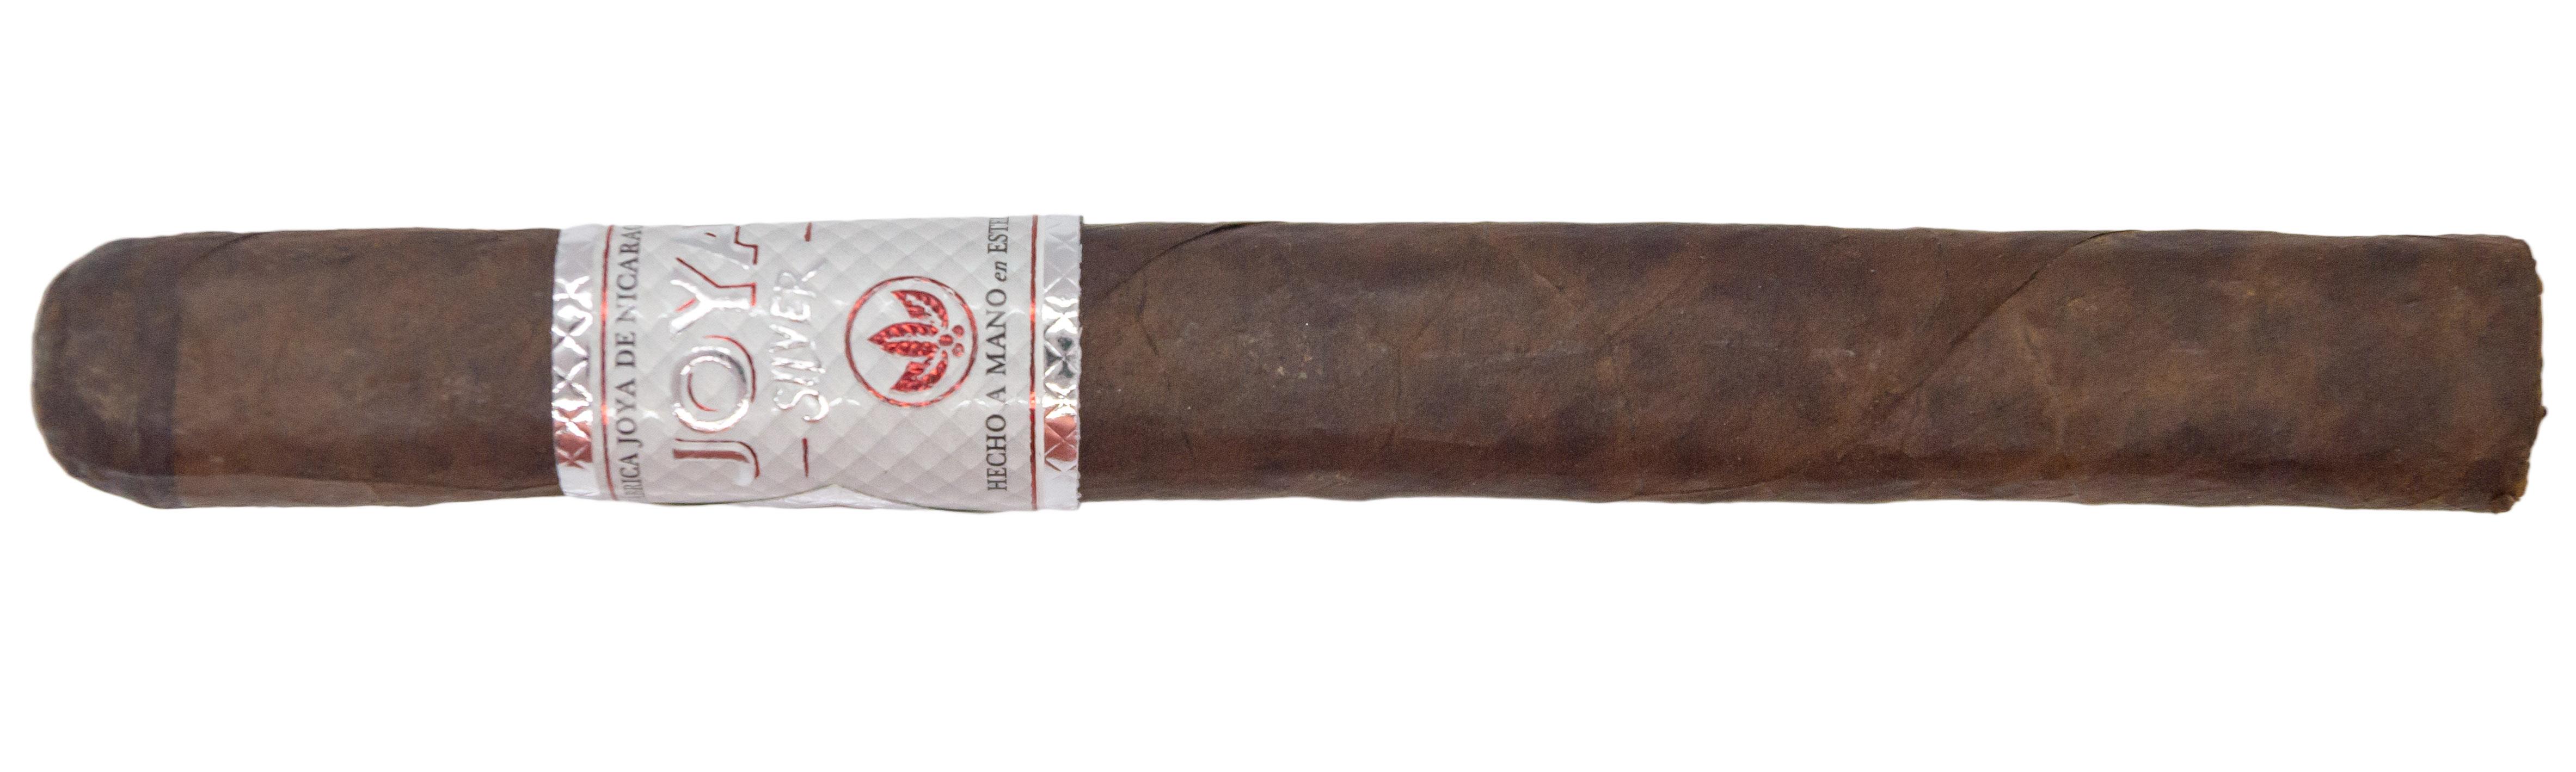 Blind Cigar Review: Joya de Nicaragua   Silver Ultra